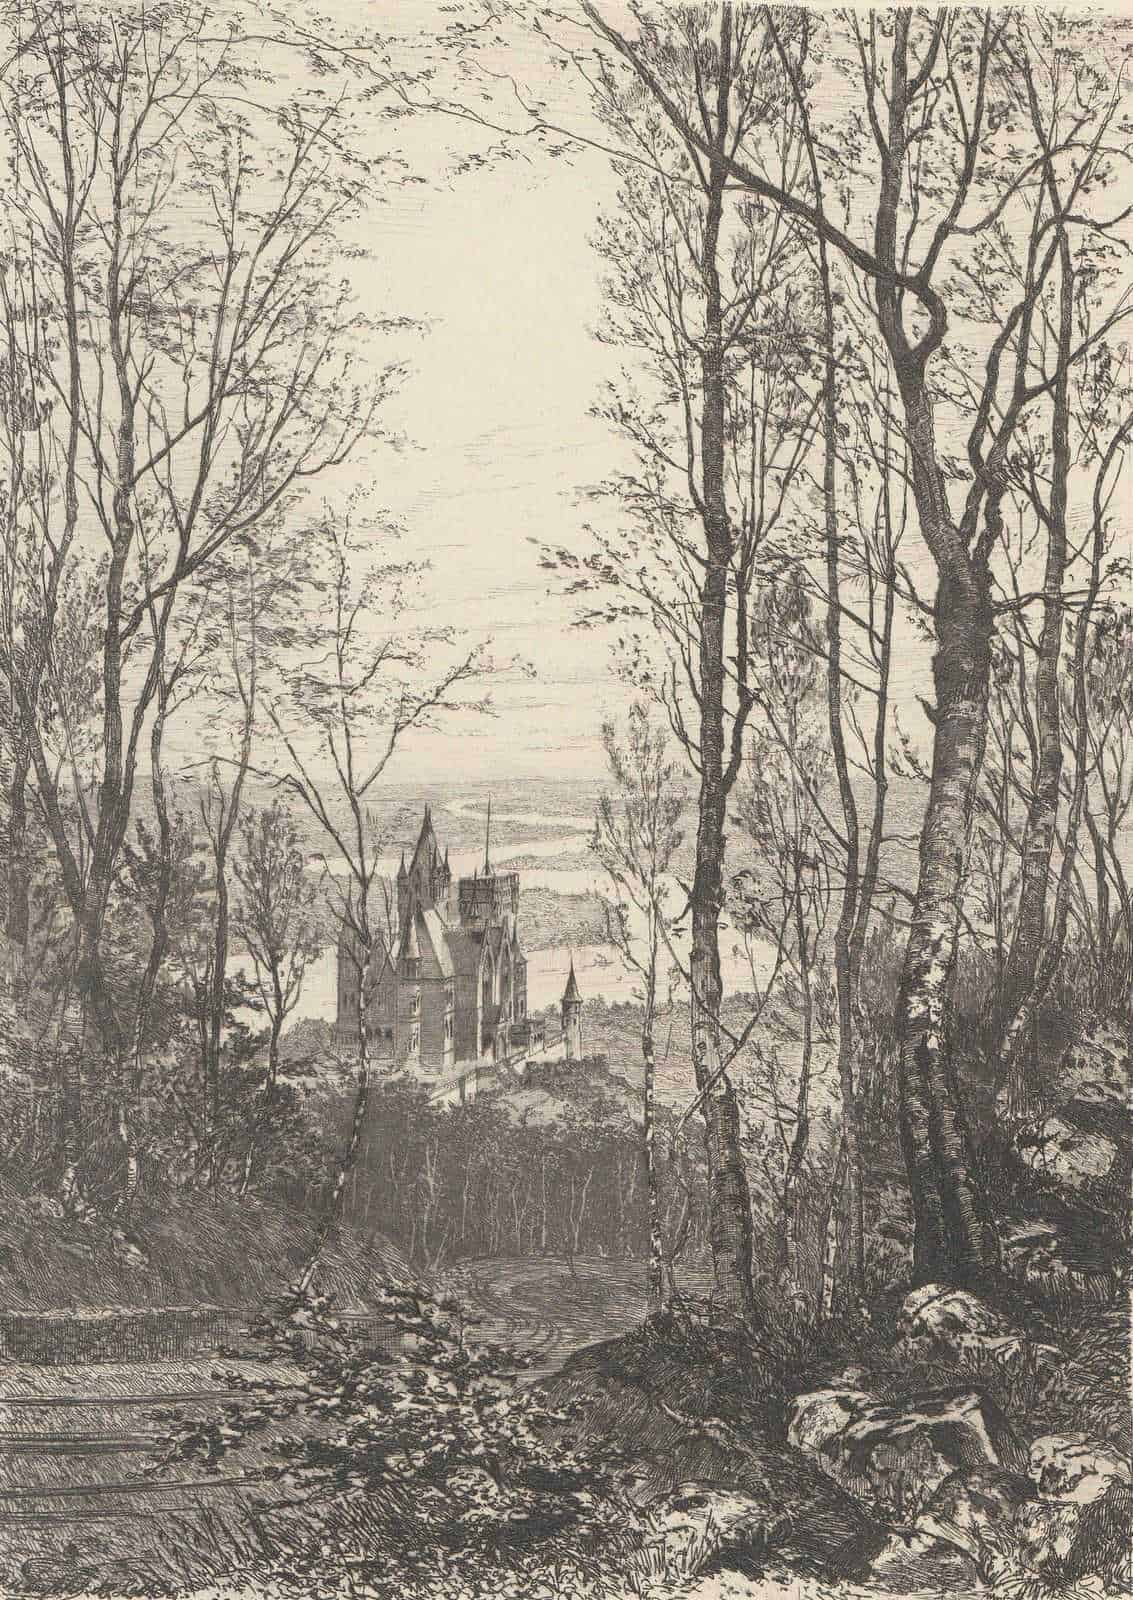 1885-Copperplate-Engraving-Siebengebirge-National-Park-Germany-Bernhard-Mannfeld-182181555132